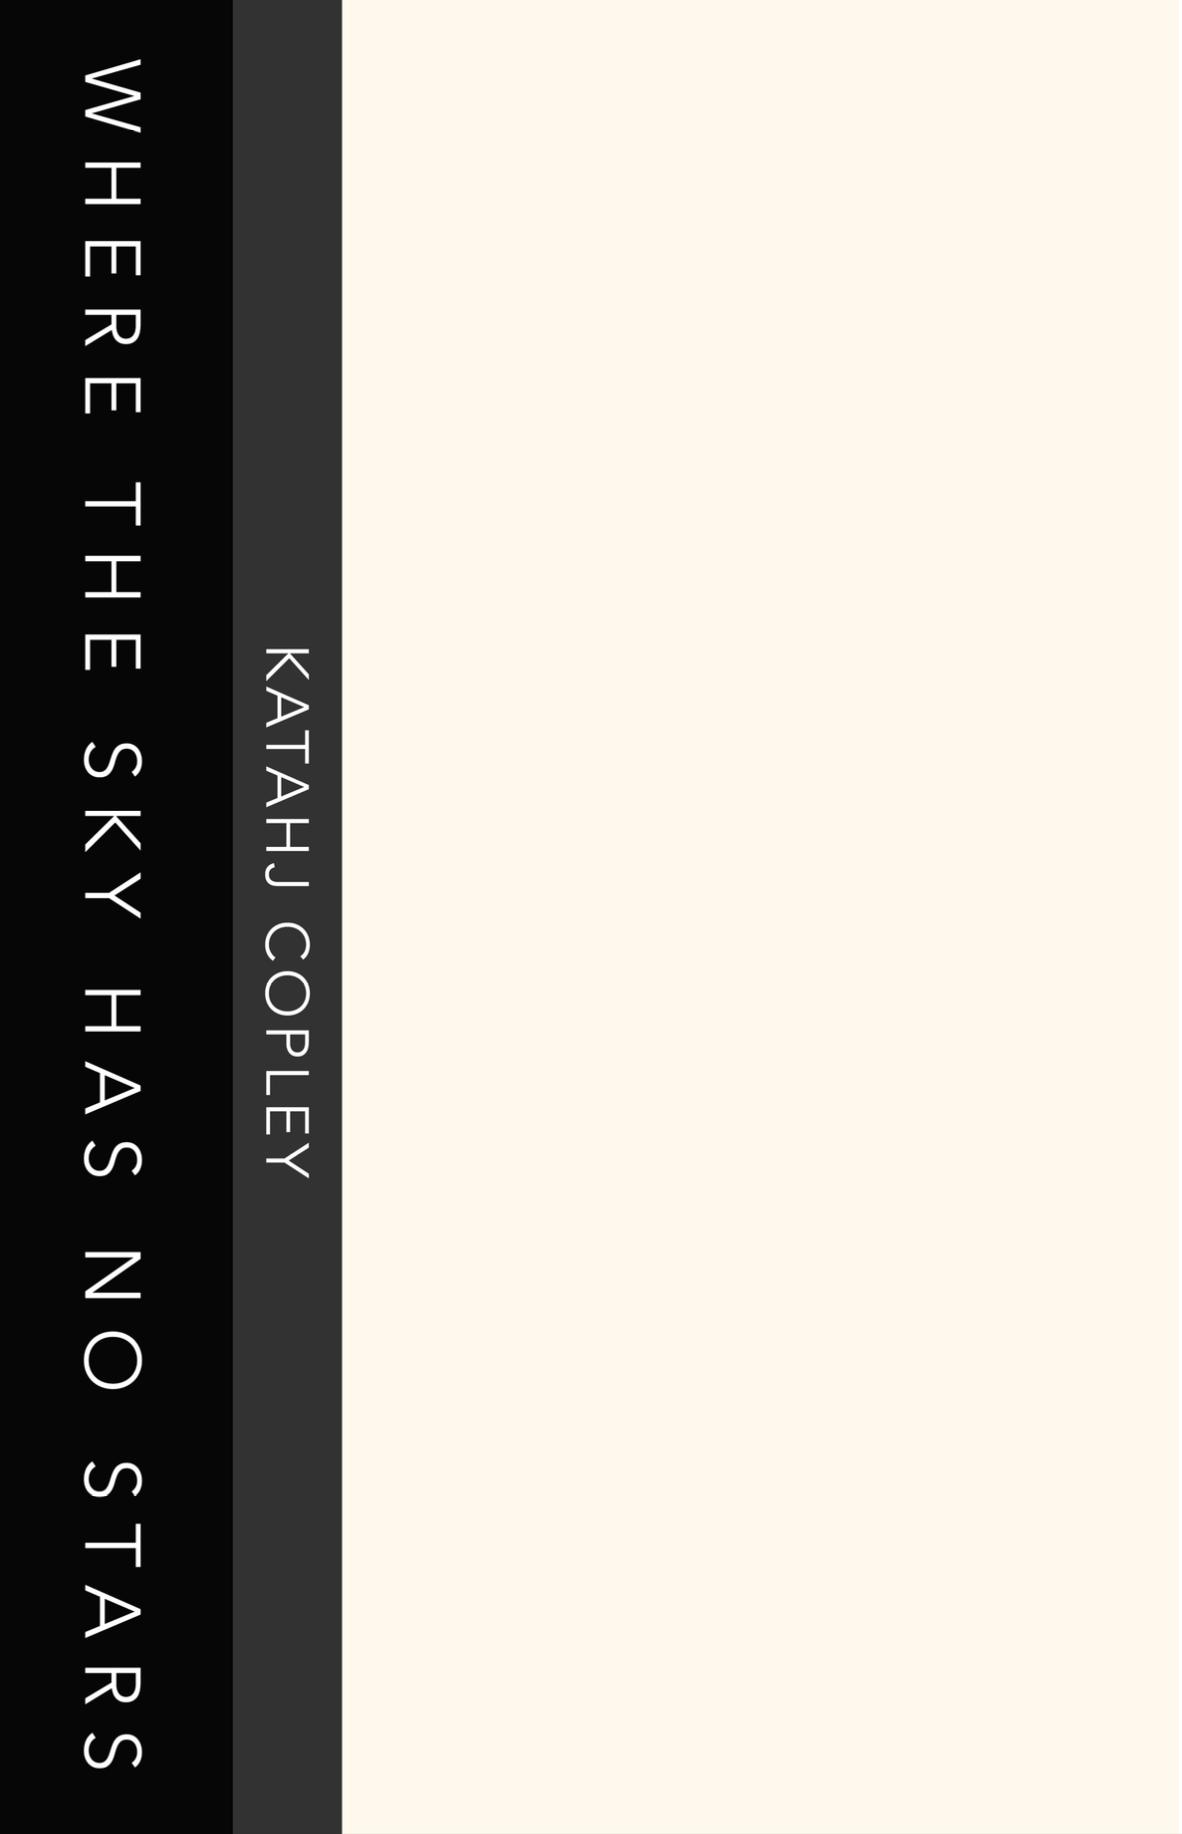 Where The Sky Has No Stars by Katahj Copley